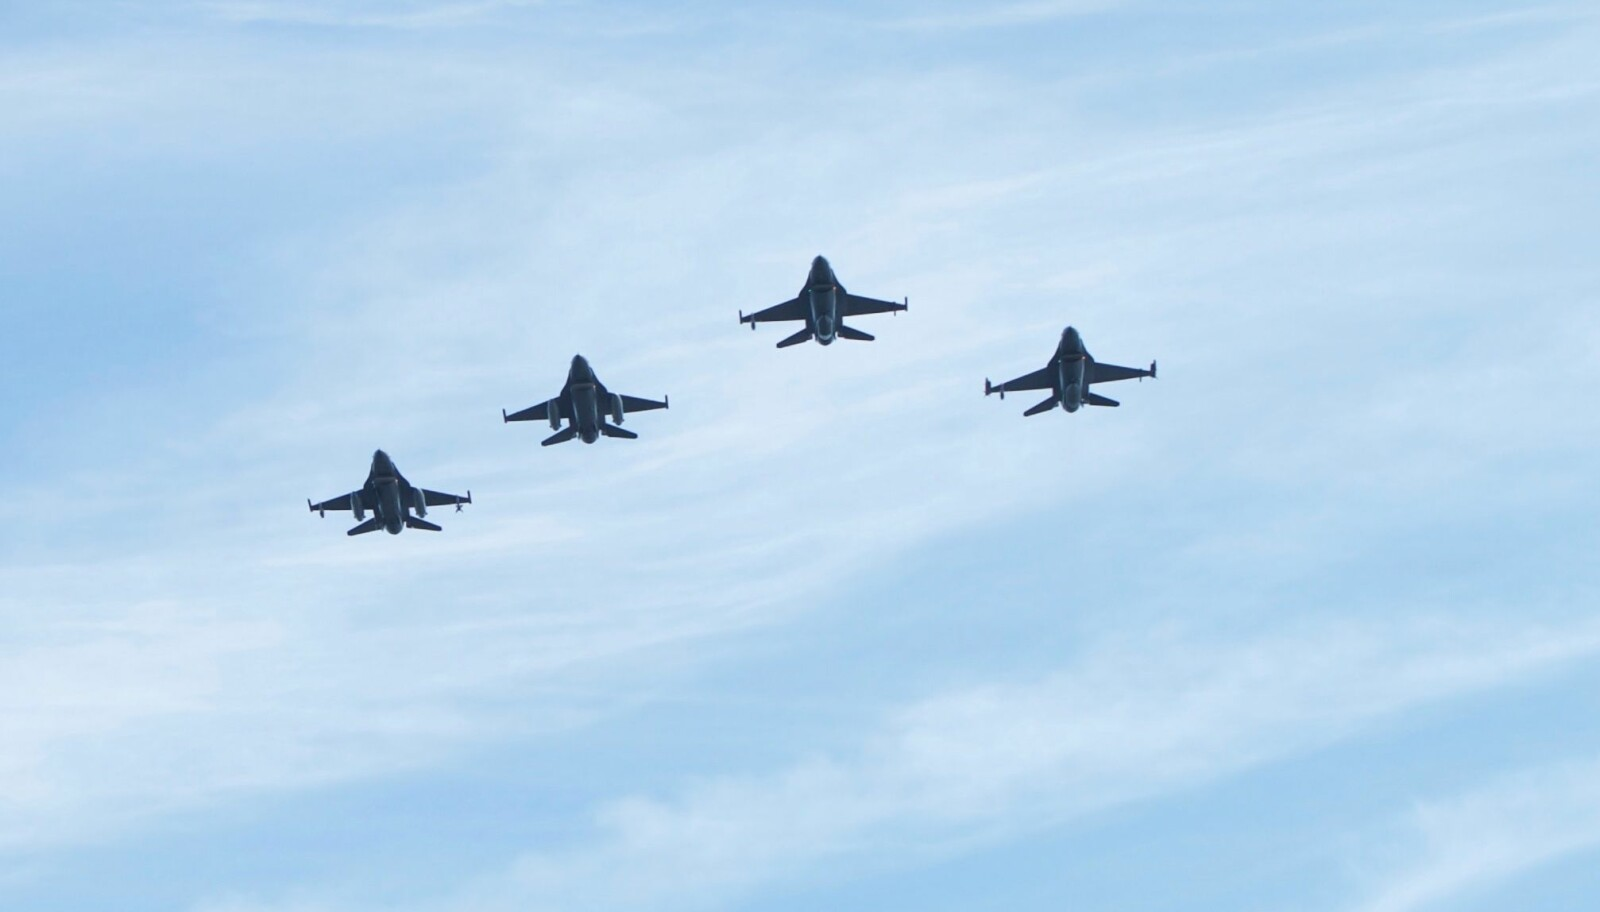 <b>MARKERING: </b> Overflyvning med fire F-16 jagerfly i forbindelse med Frigjørings- og Veterandagen 2018.